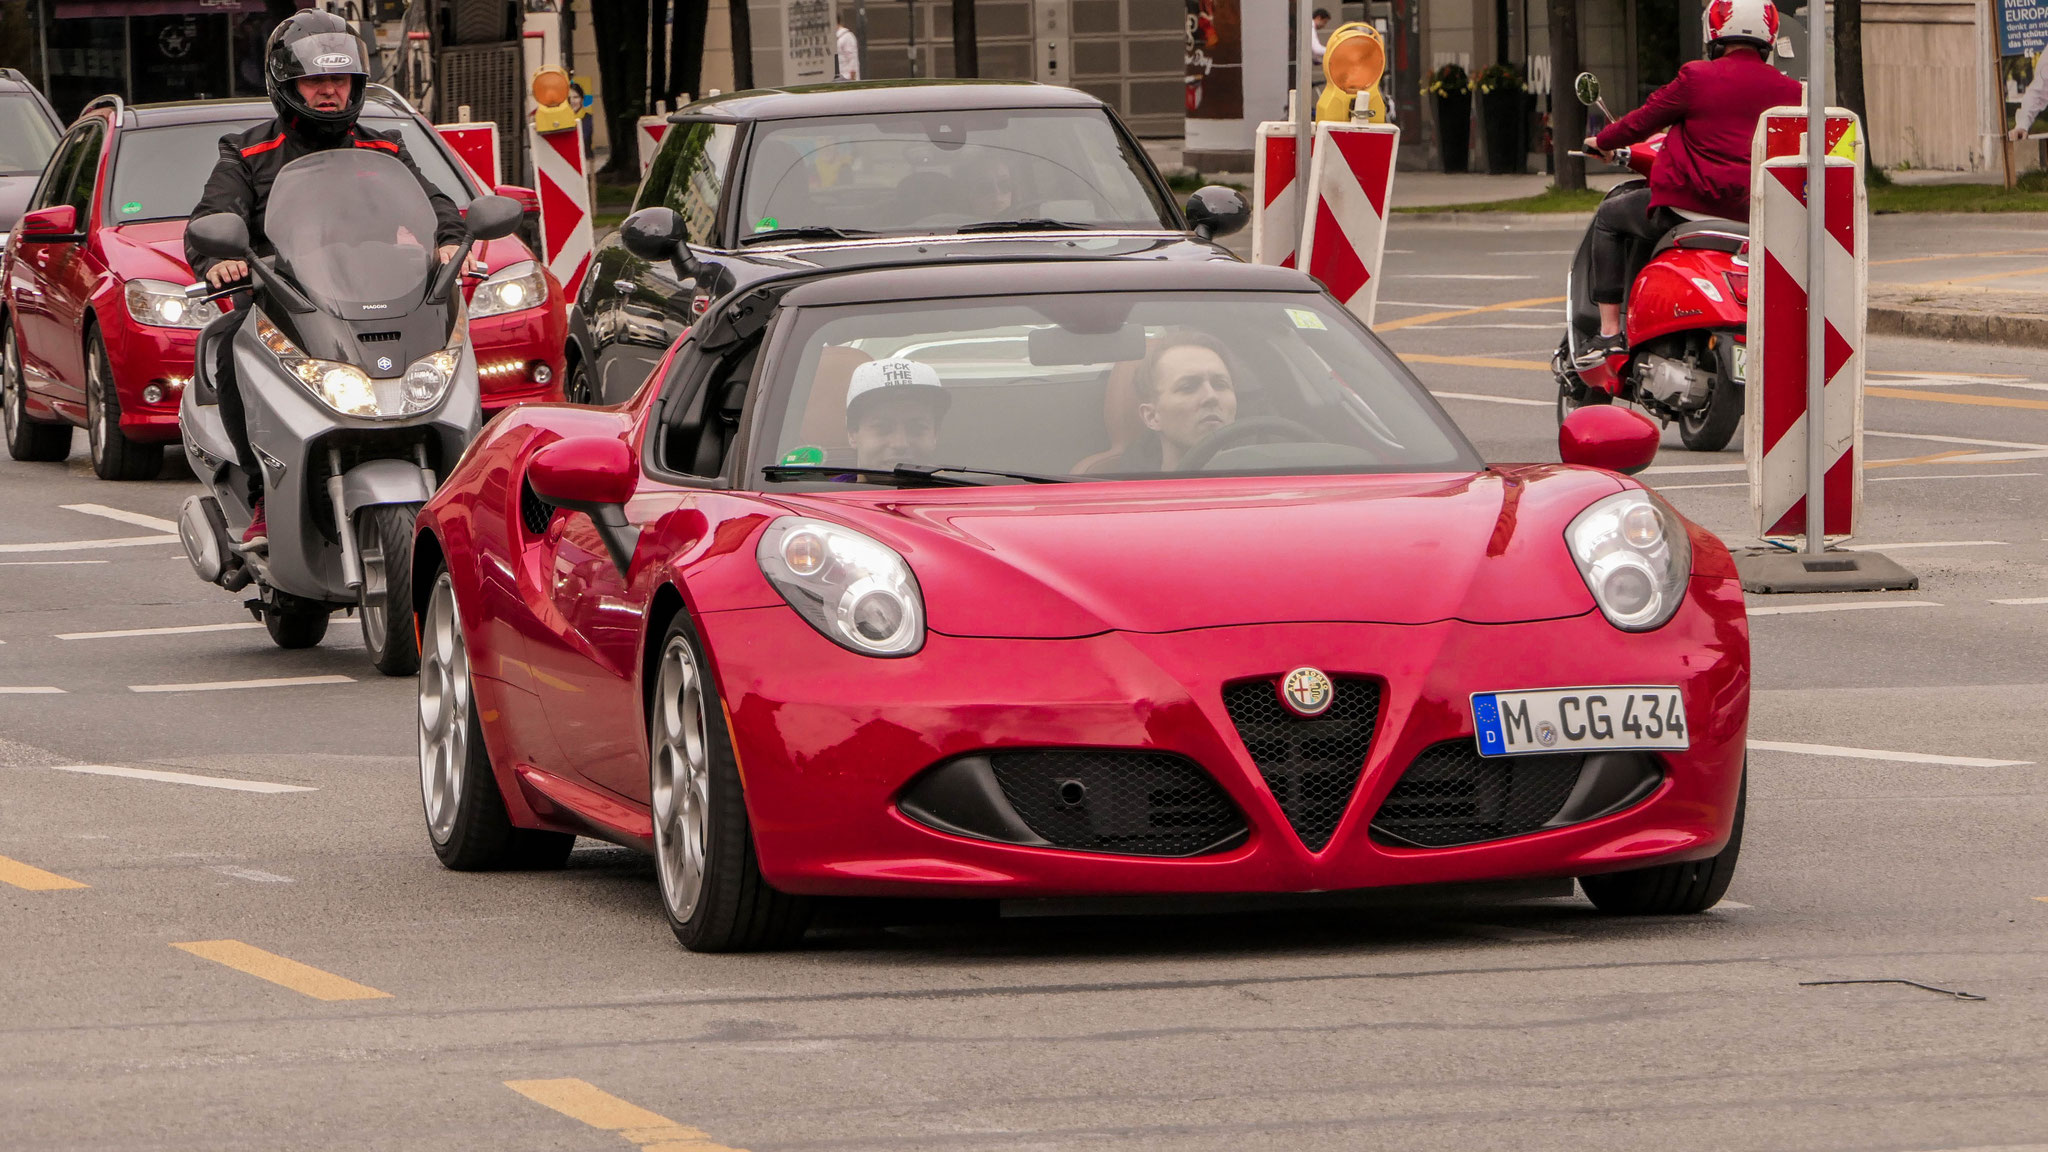 Alfa Romeo 4C Spyder - M-CG-434